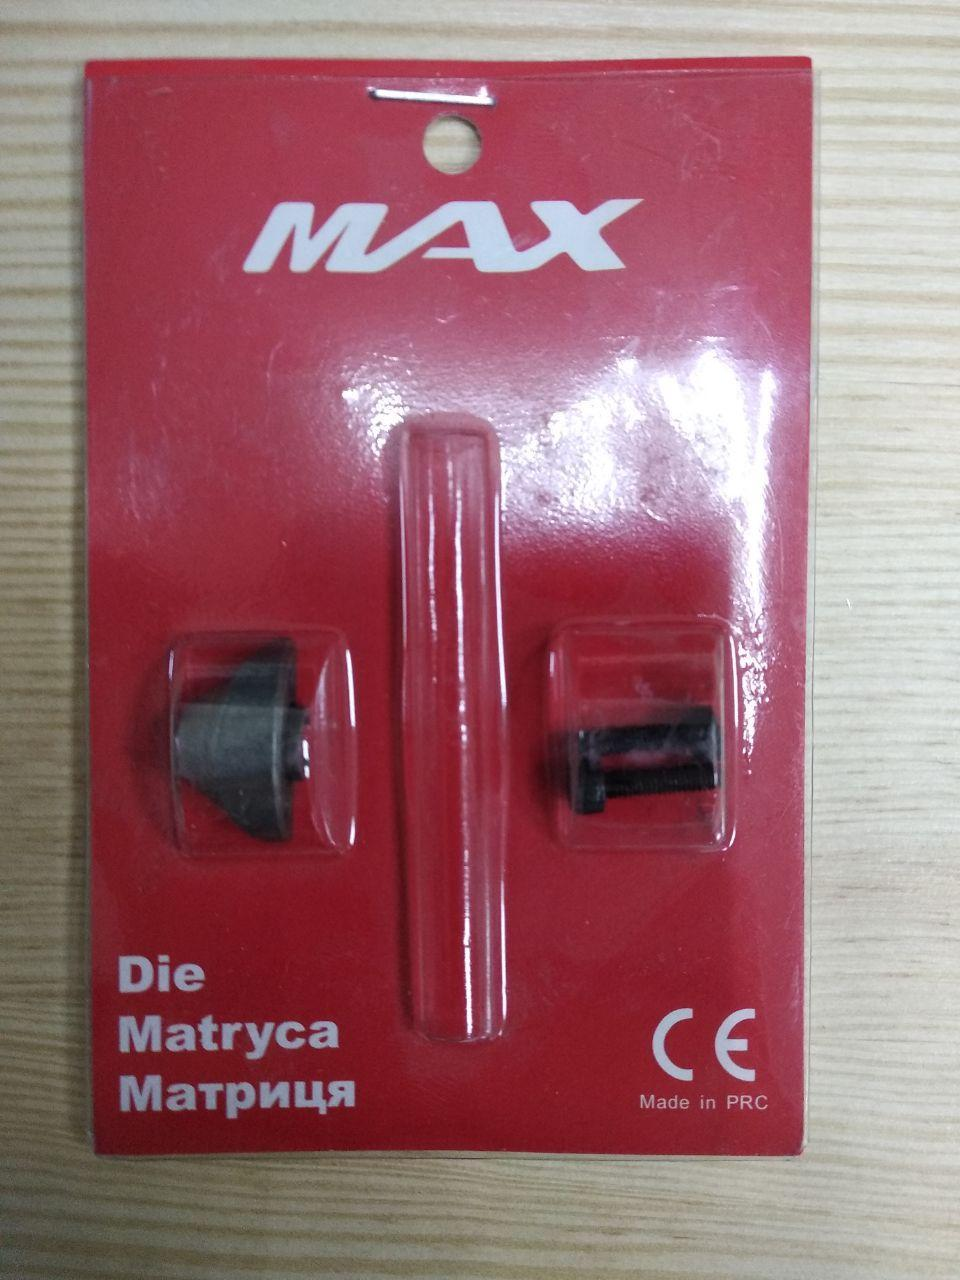 Матрица для электроножниц MAX